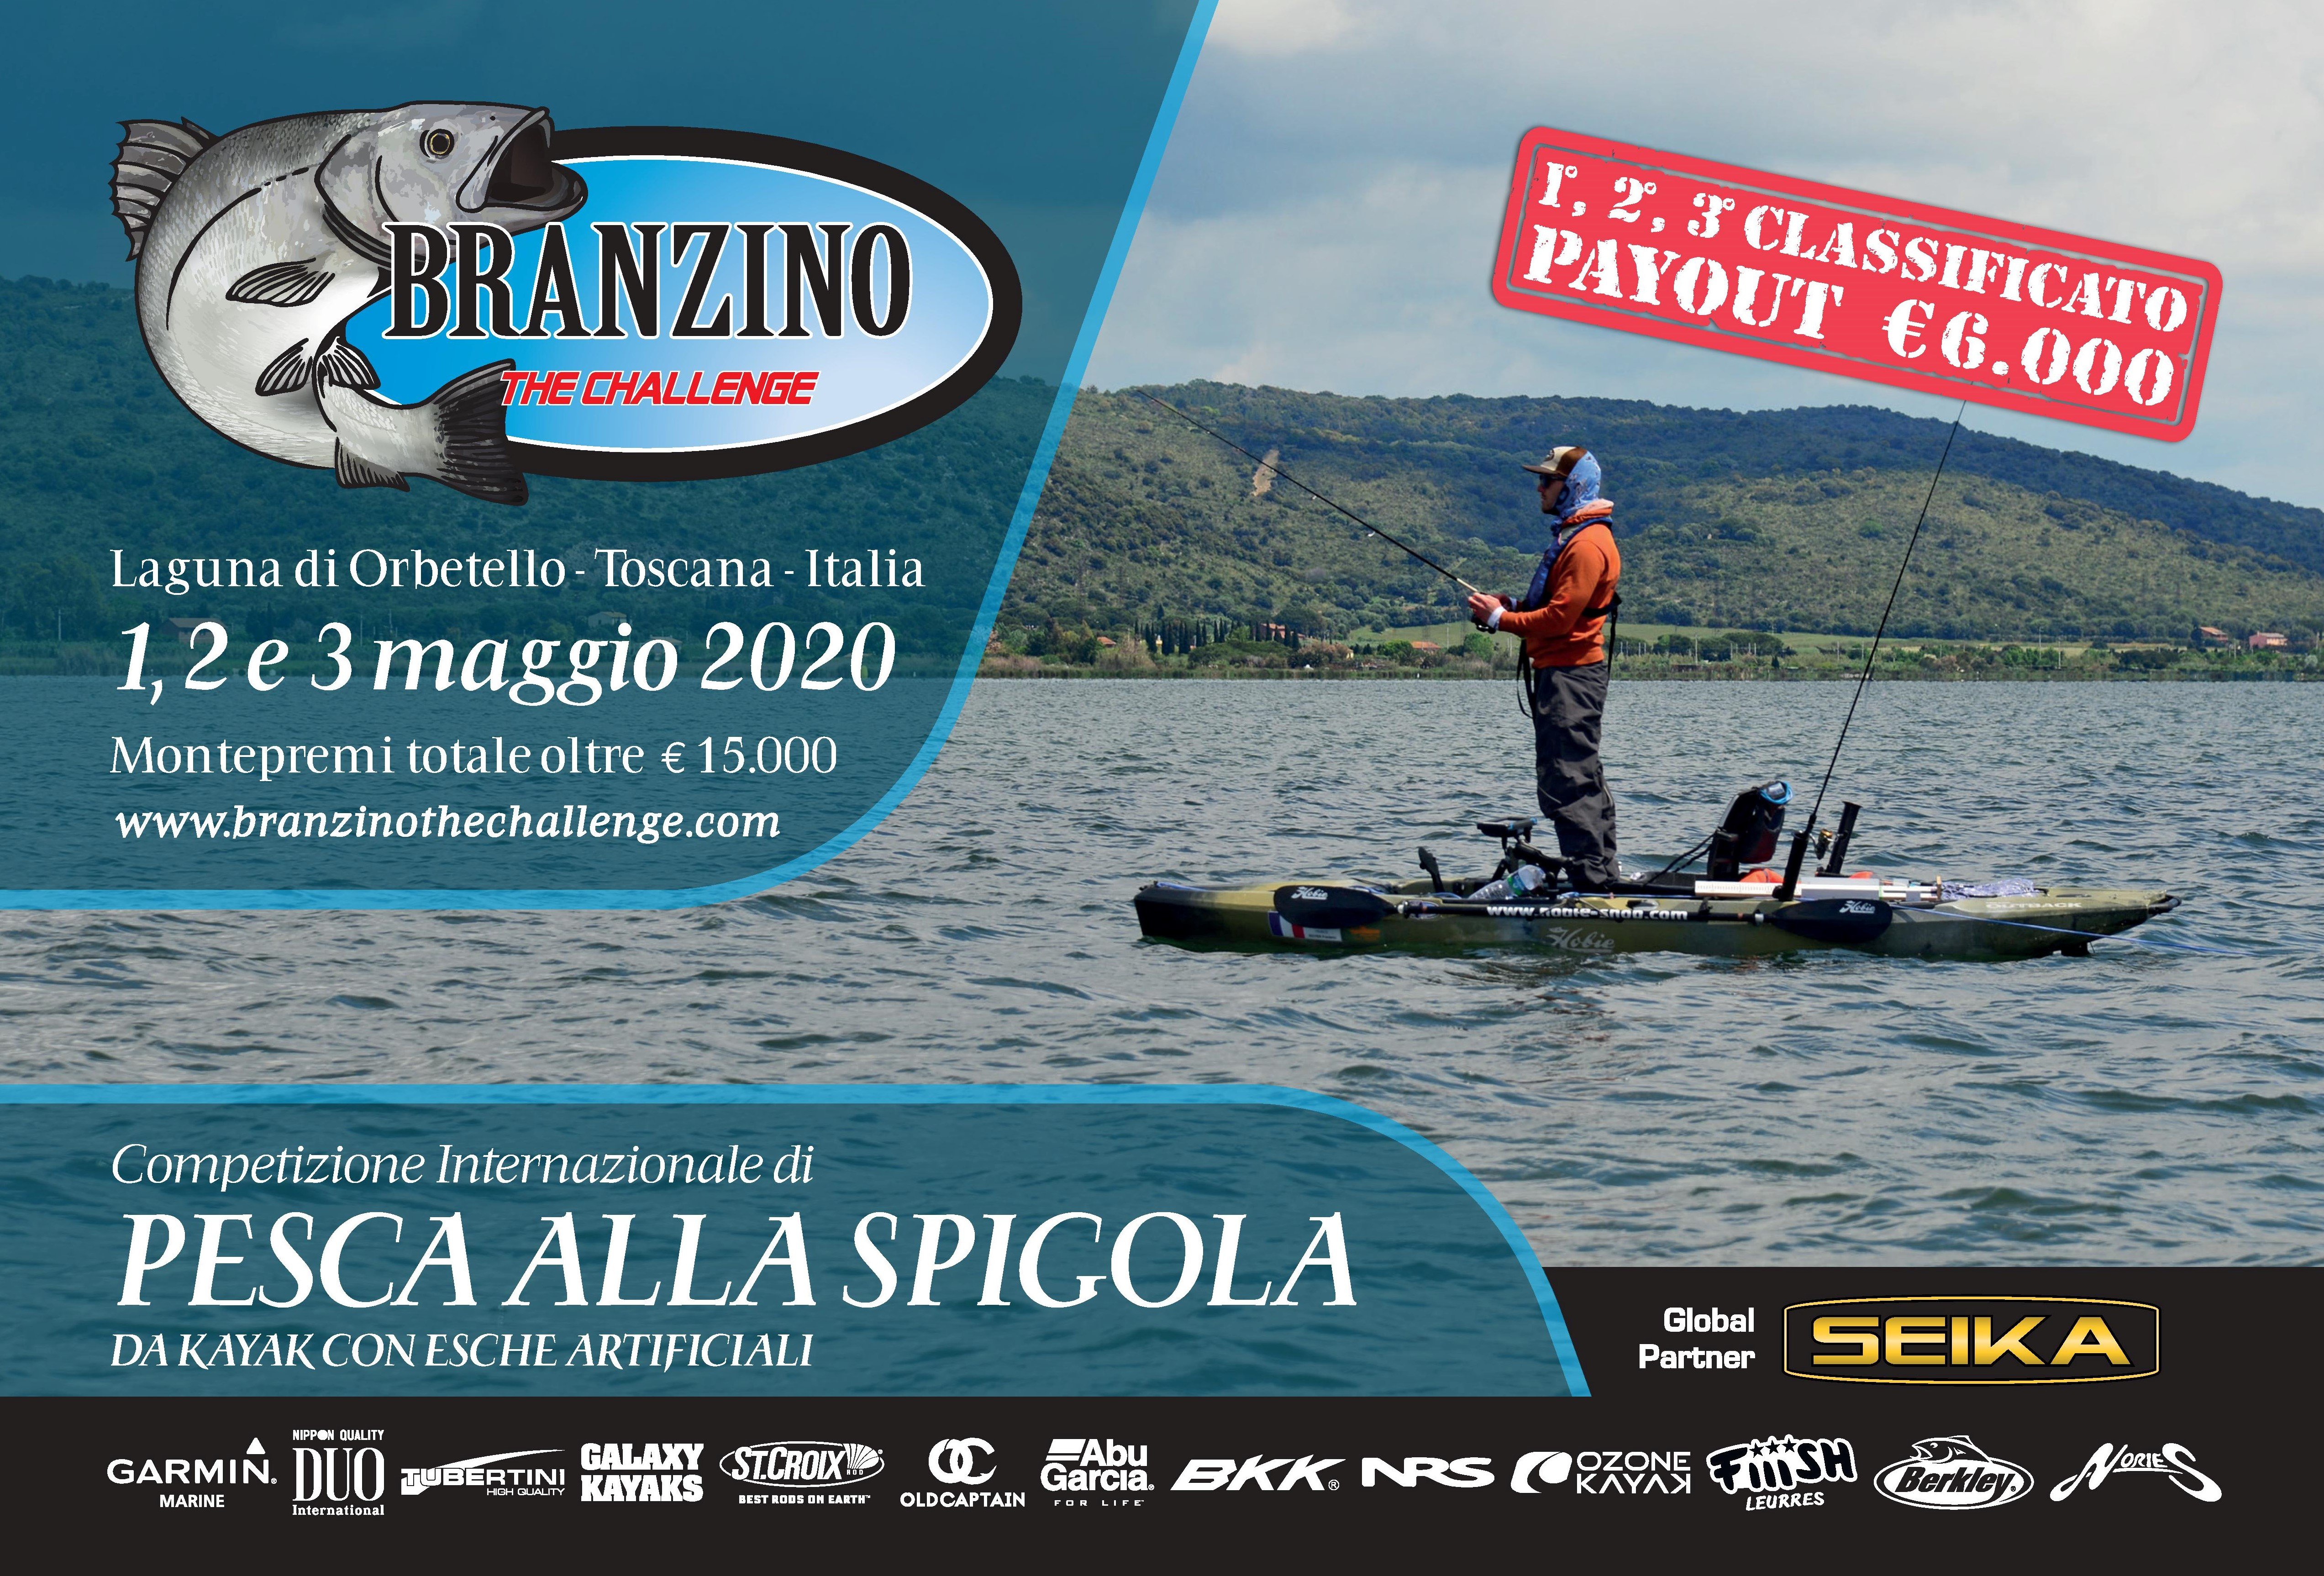 Orbetello: Branzino The Challenge 2020, torna la sfida in kayak